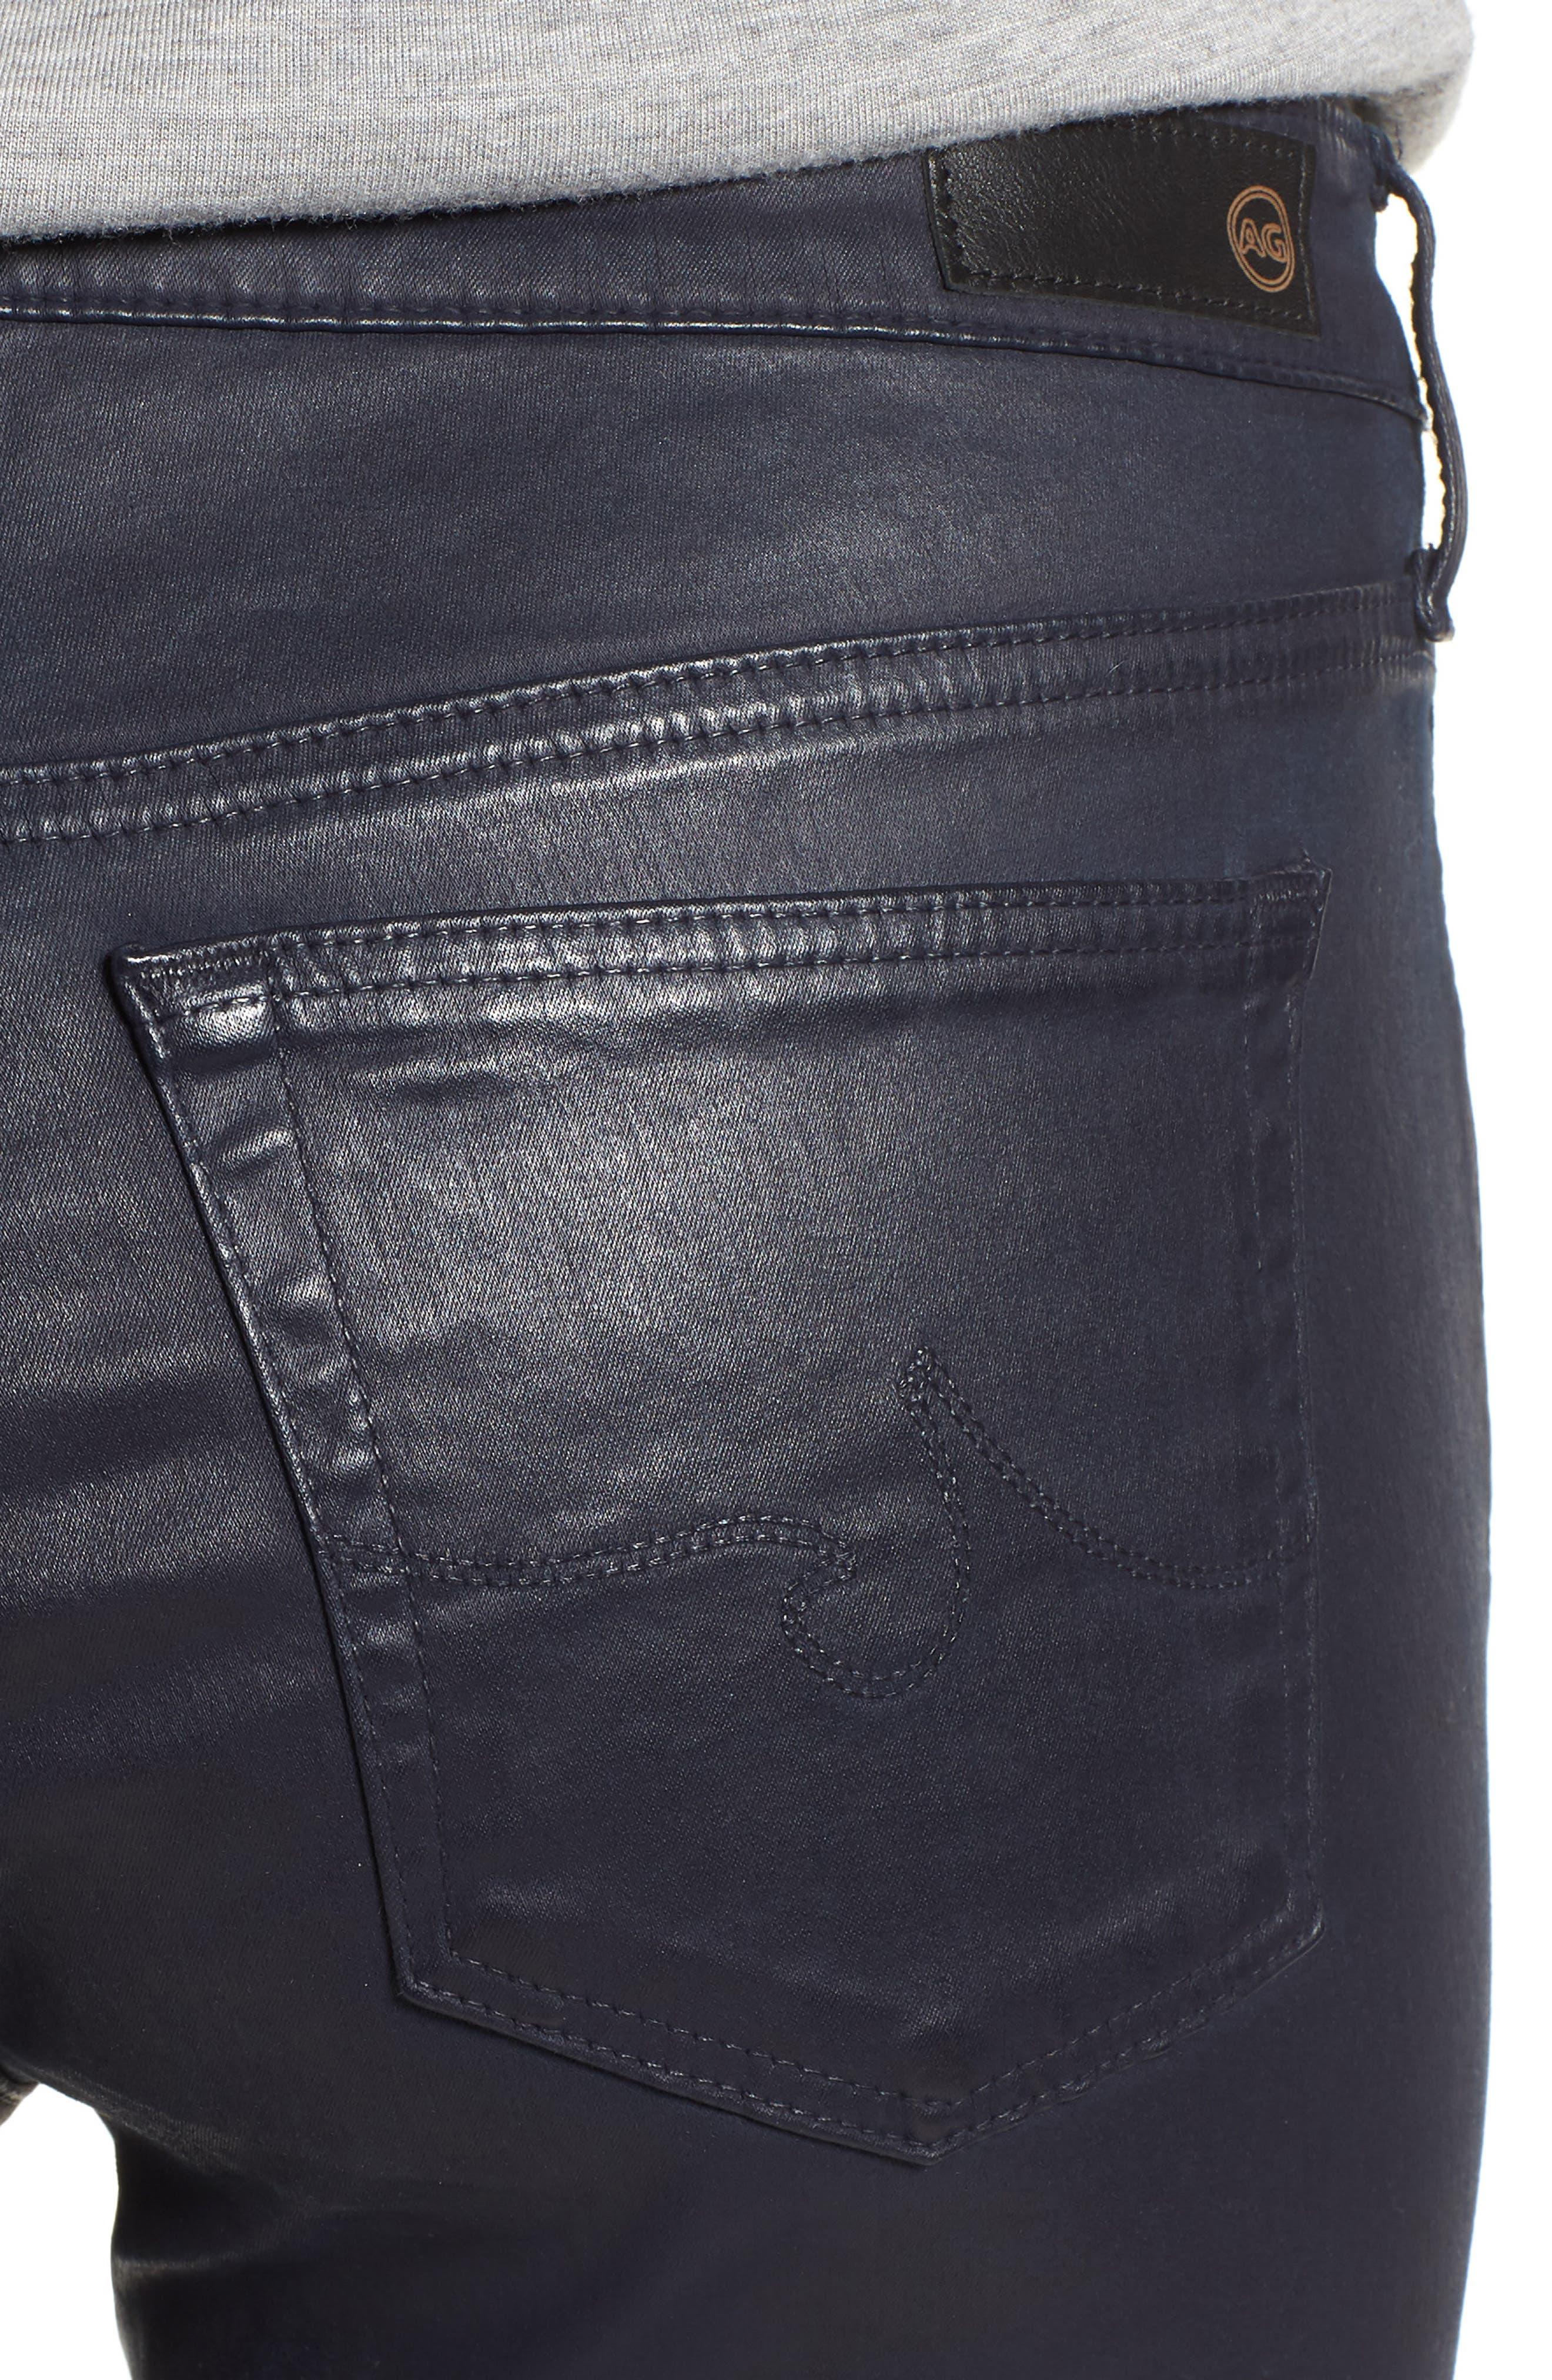 'The Legging' Coated Ankle Jeans,                             Alternate thumbnail 4, color,                             LEATHERETT BLUE VAULT